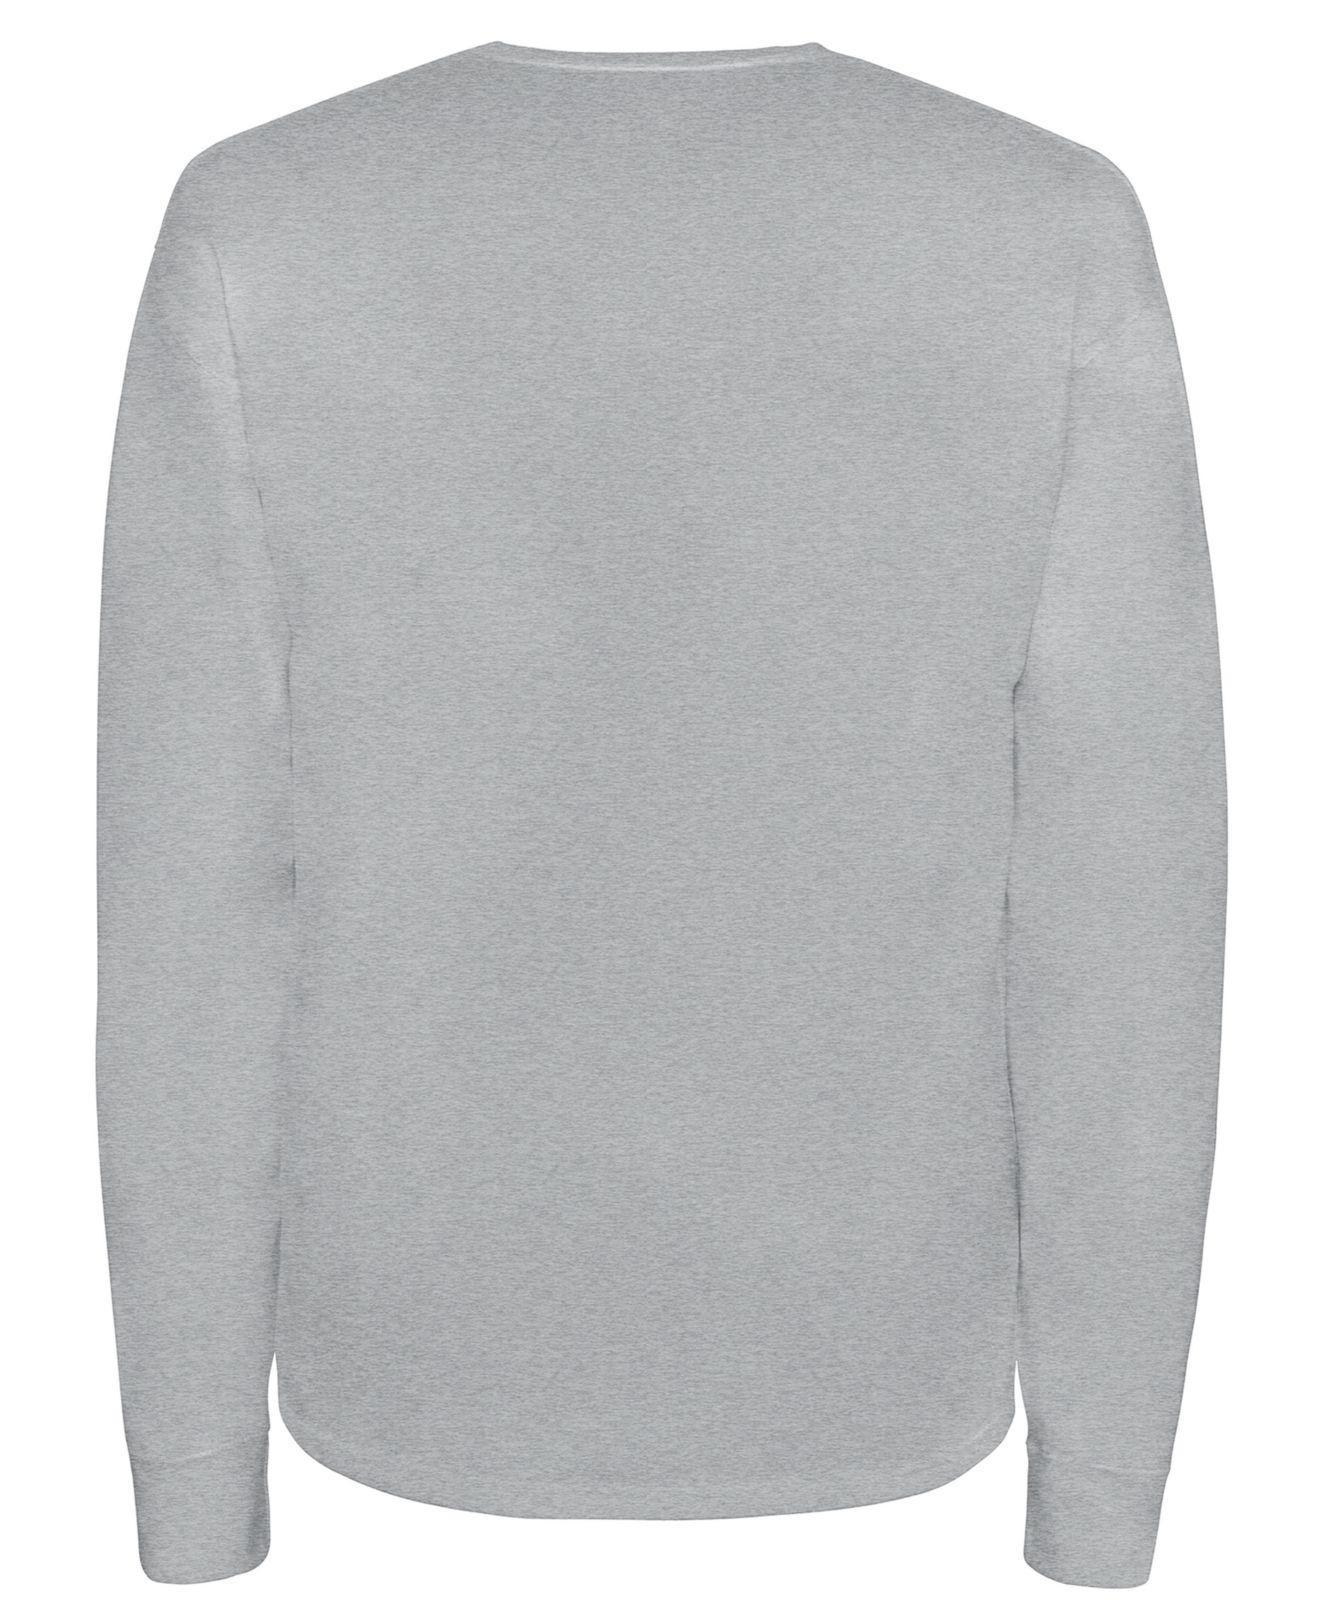 e983a0e6 Lyst - Champion Long-sleeve Logo T-shirt in Gray for Men